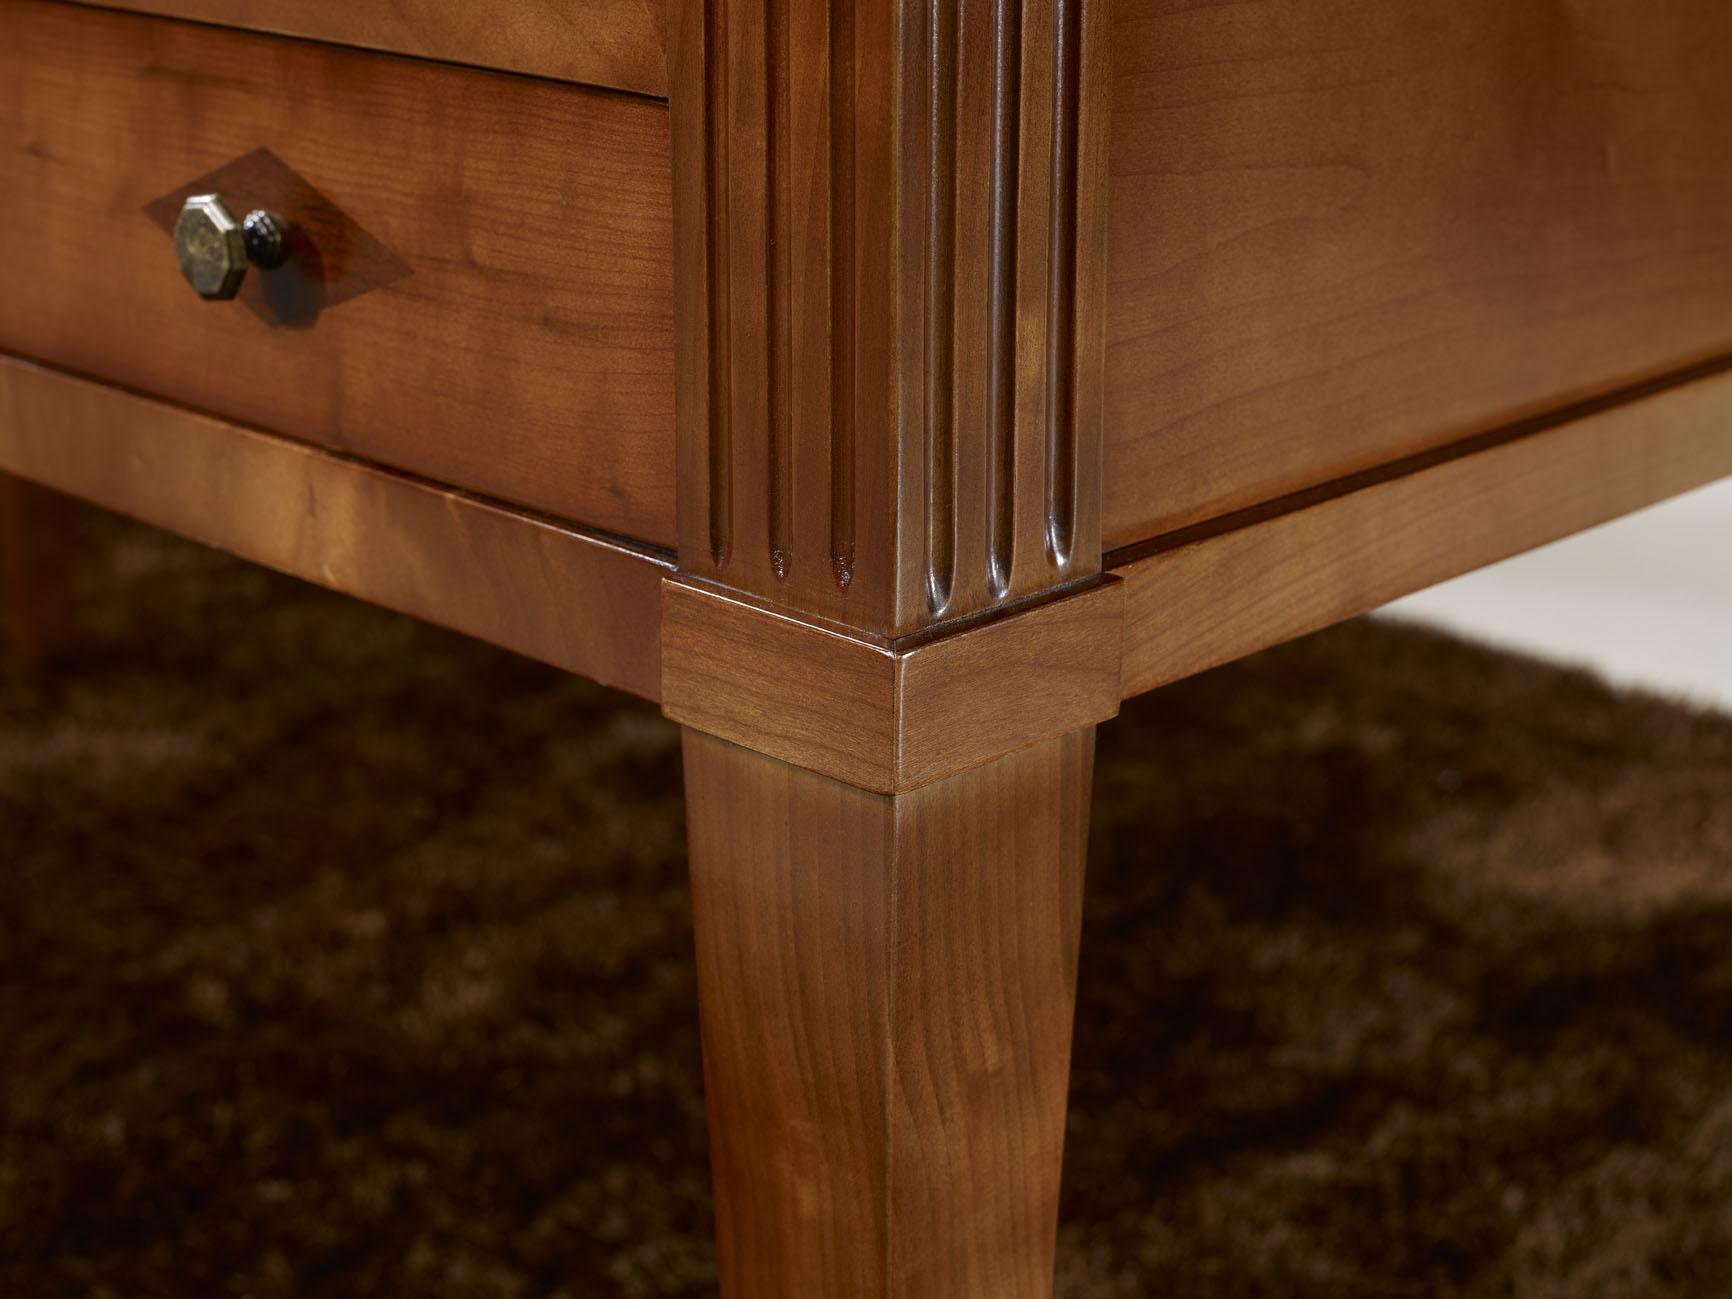 bureau ministre en merisier massif de style directoire meuble en merisier massif. Black Bedroom Furniture Sets. Home Design Ideas